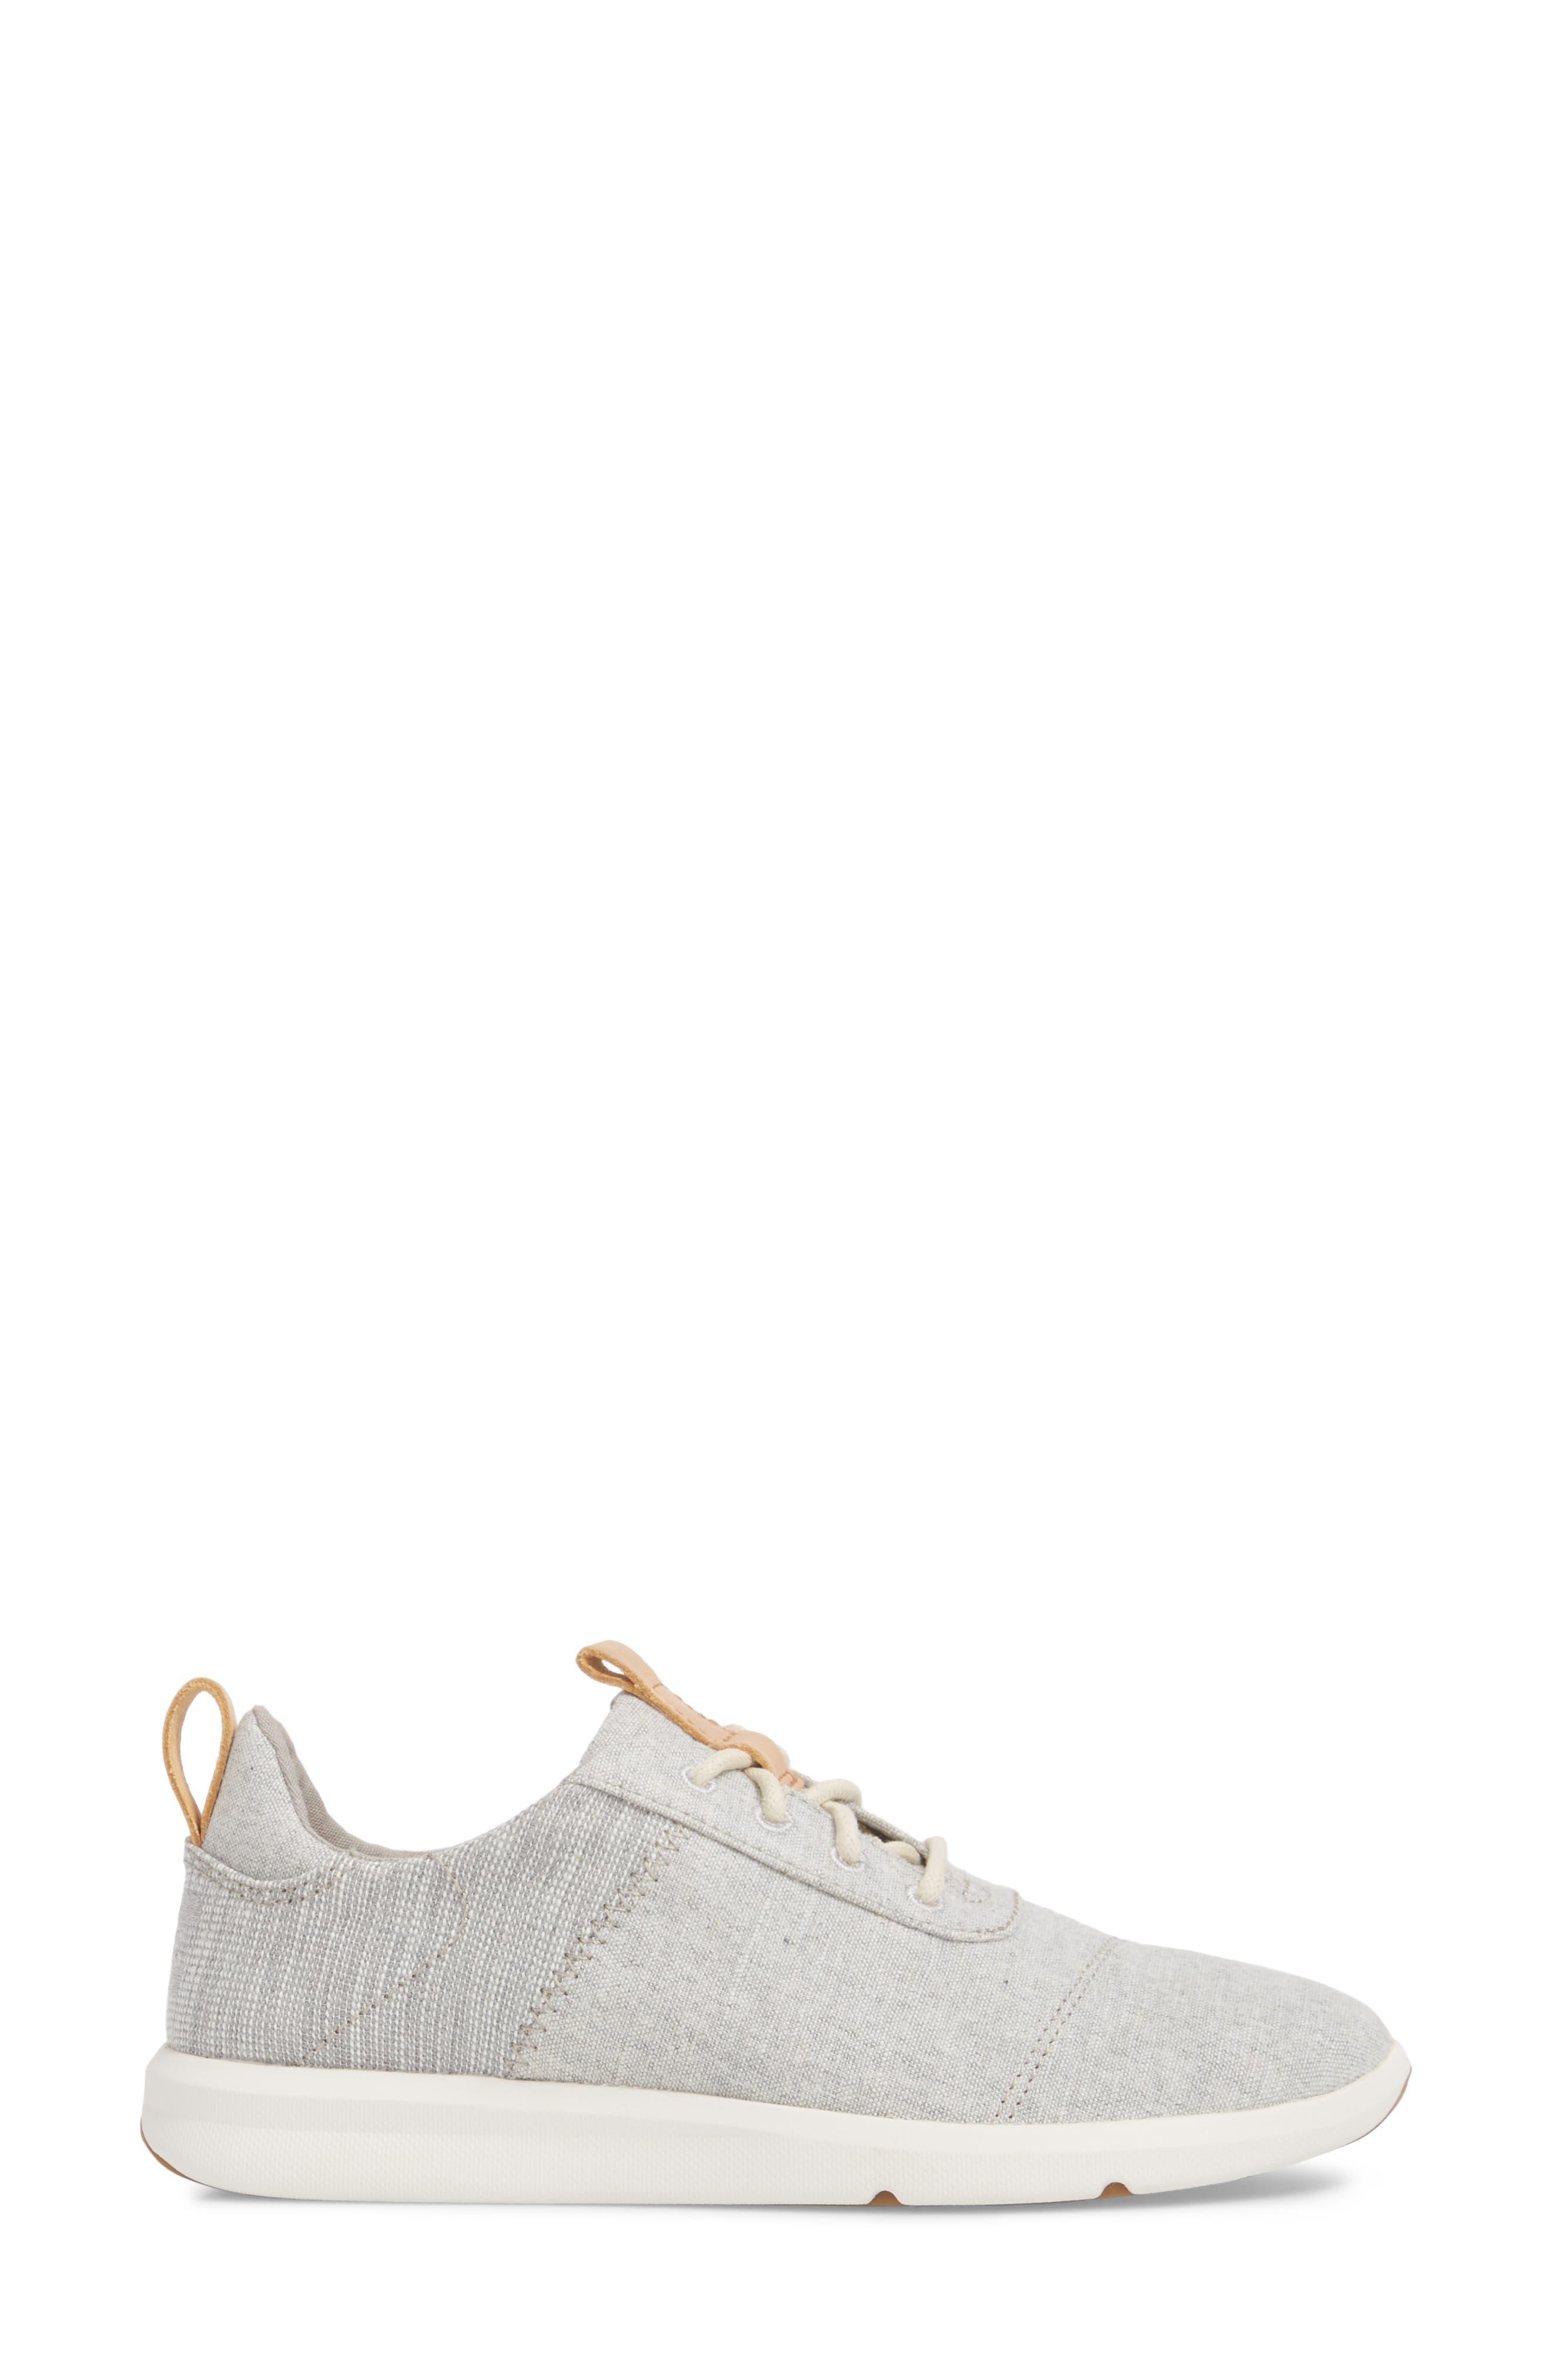 Cabrillo Sneaker,                             Alternate thumbnail 3, color,                             DRIZZLE GREY CHAMBRAY MIX